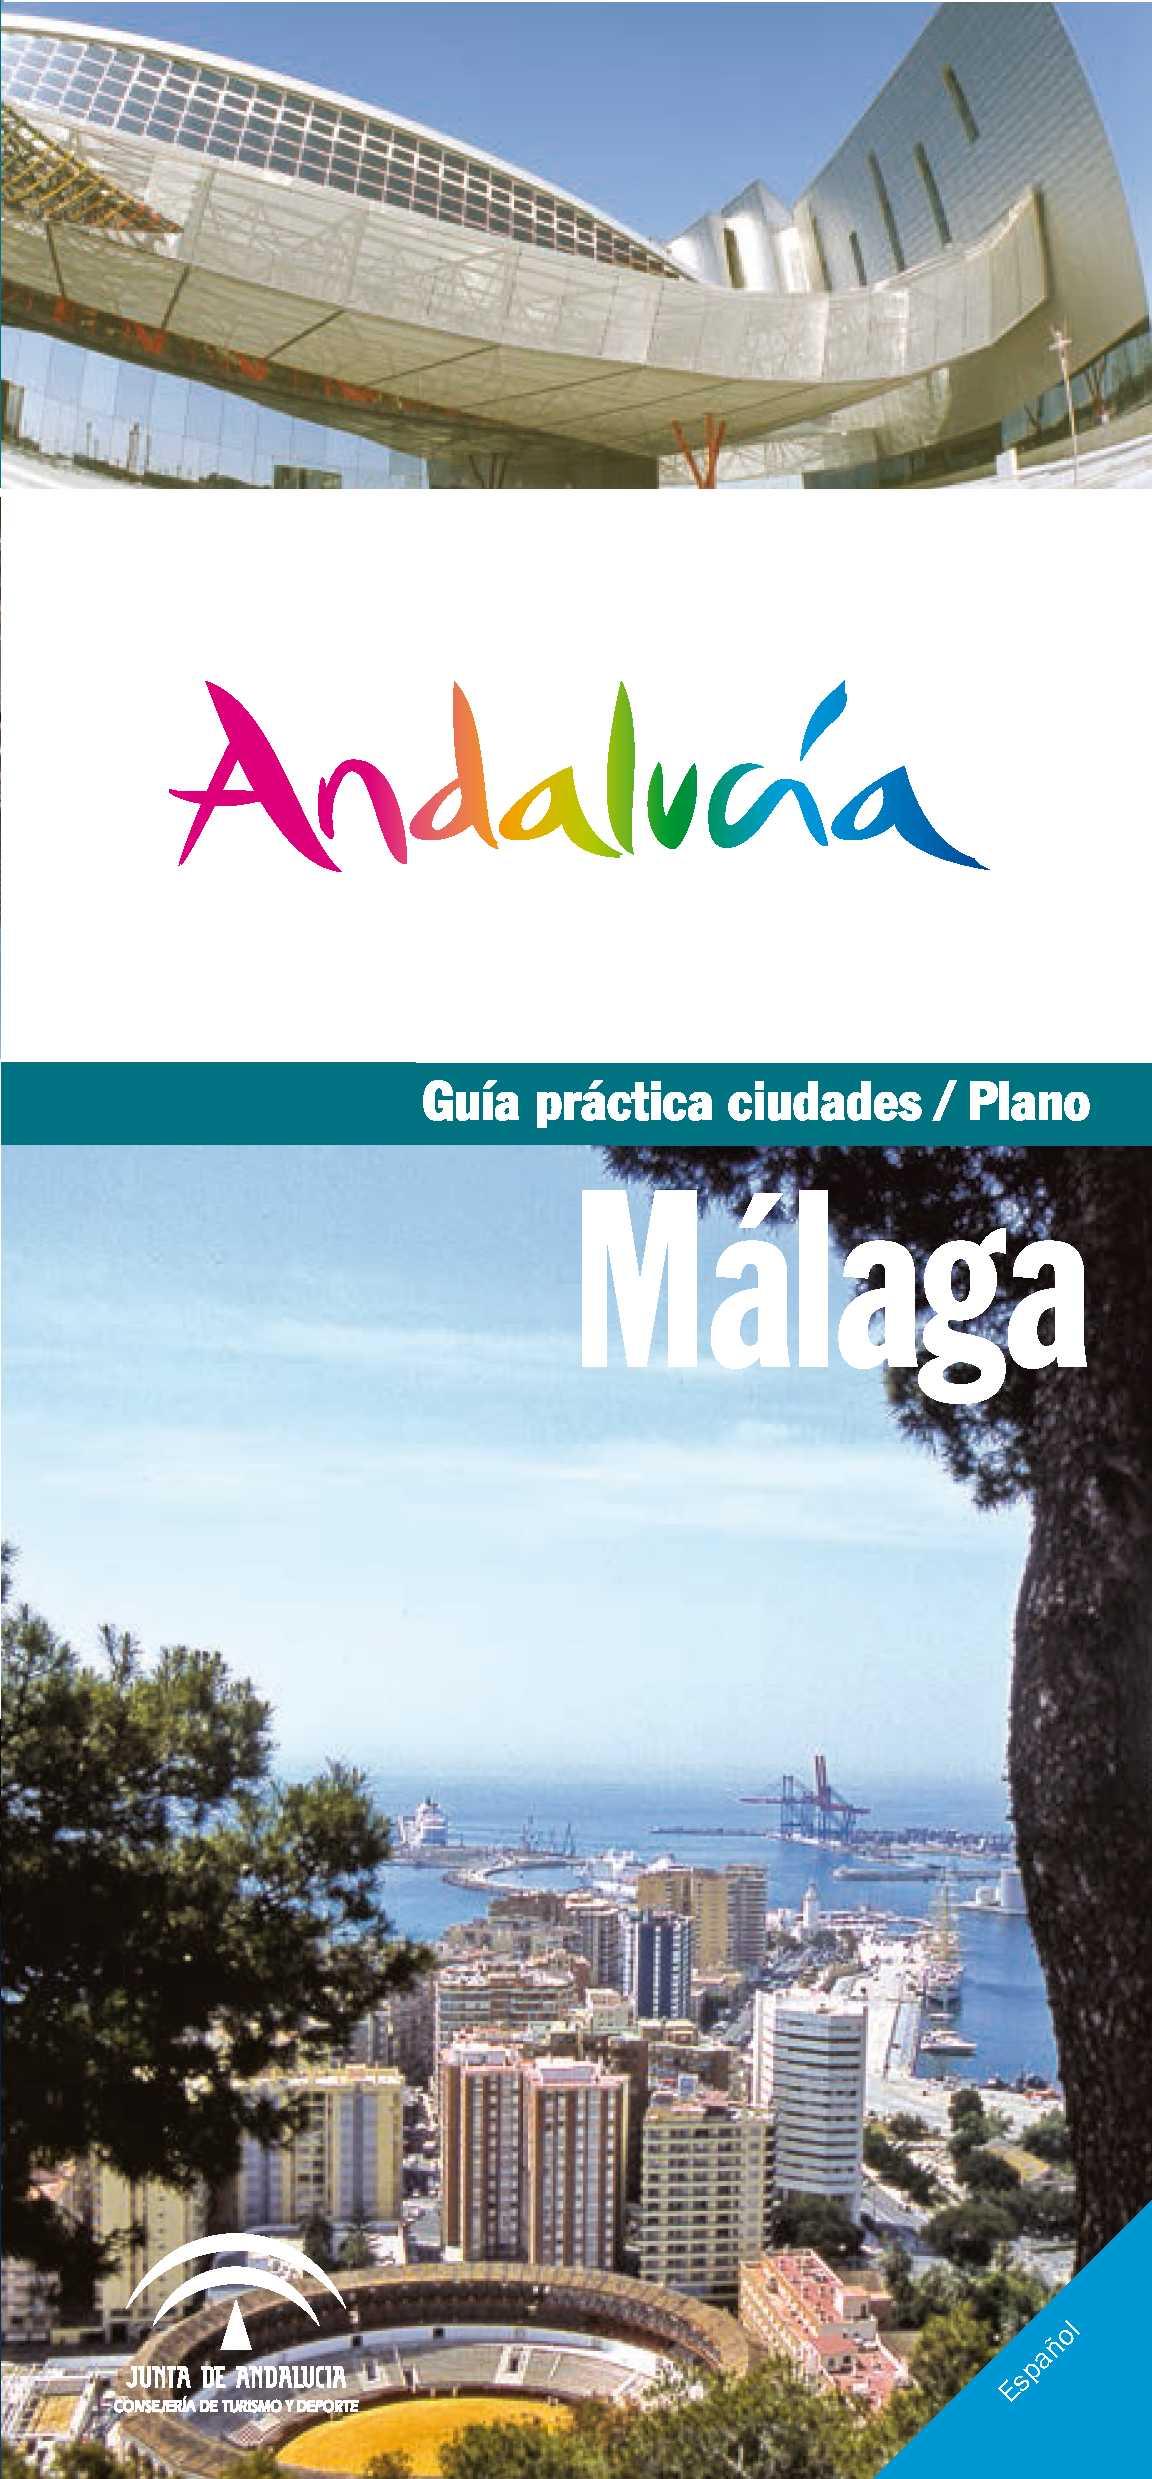 guia_practica_ciudad_malaga.png